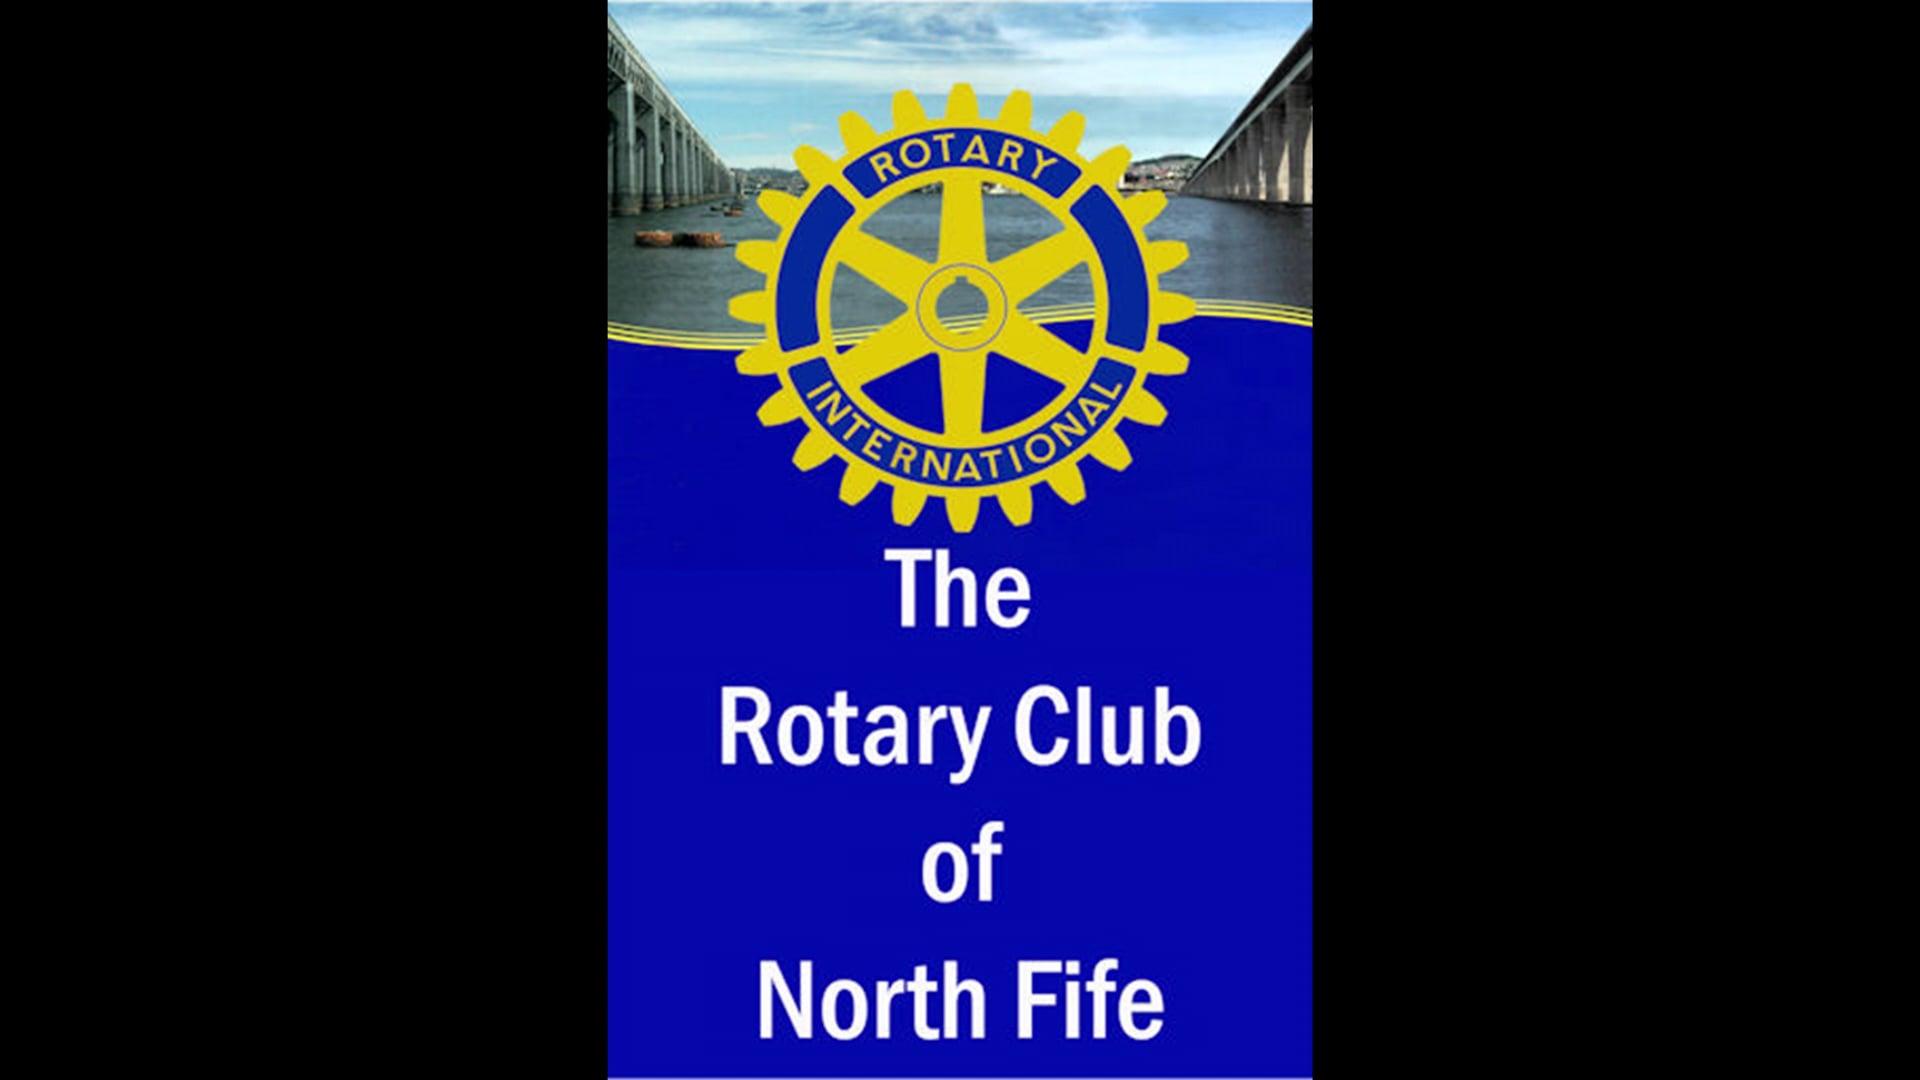 Rotary club presentation.mp4